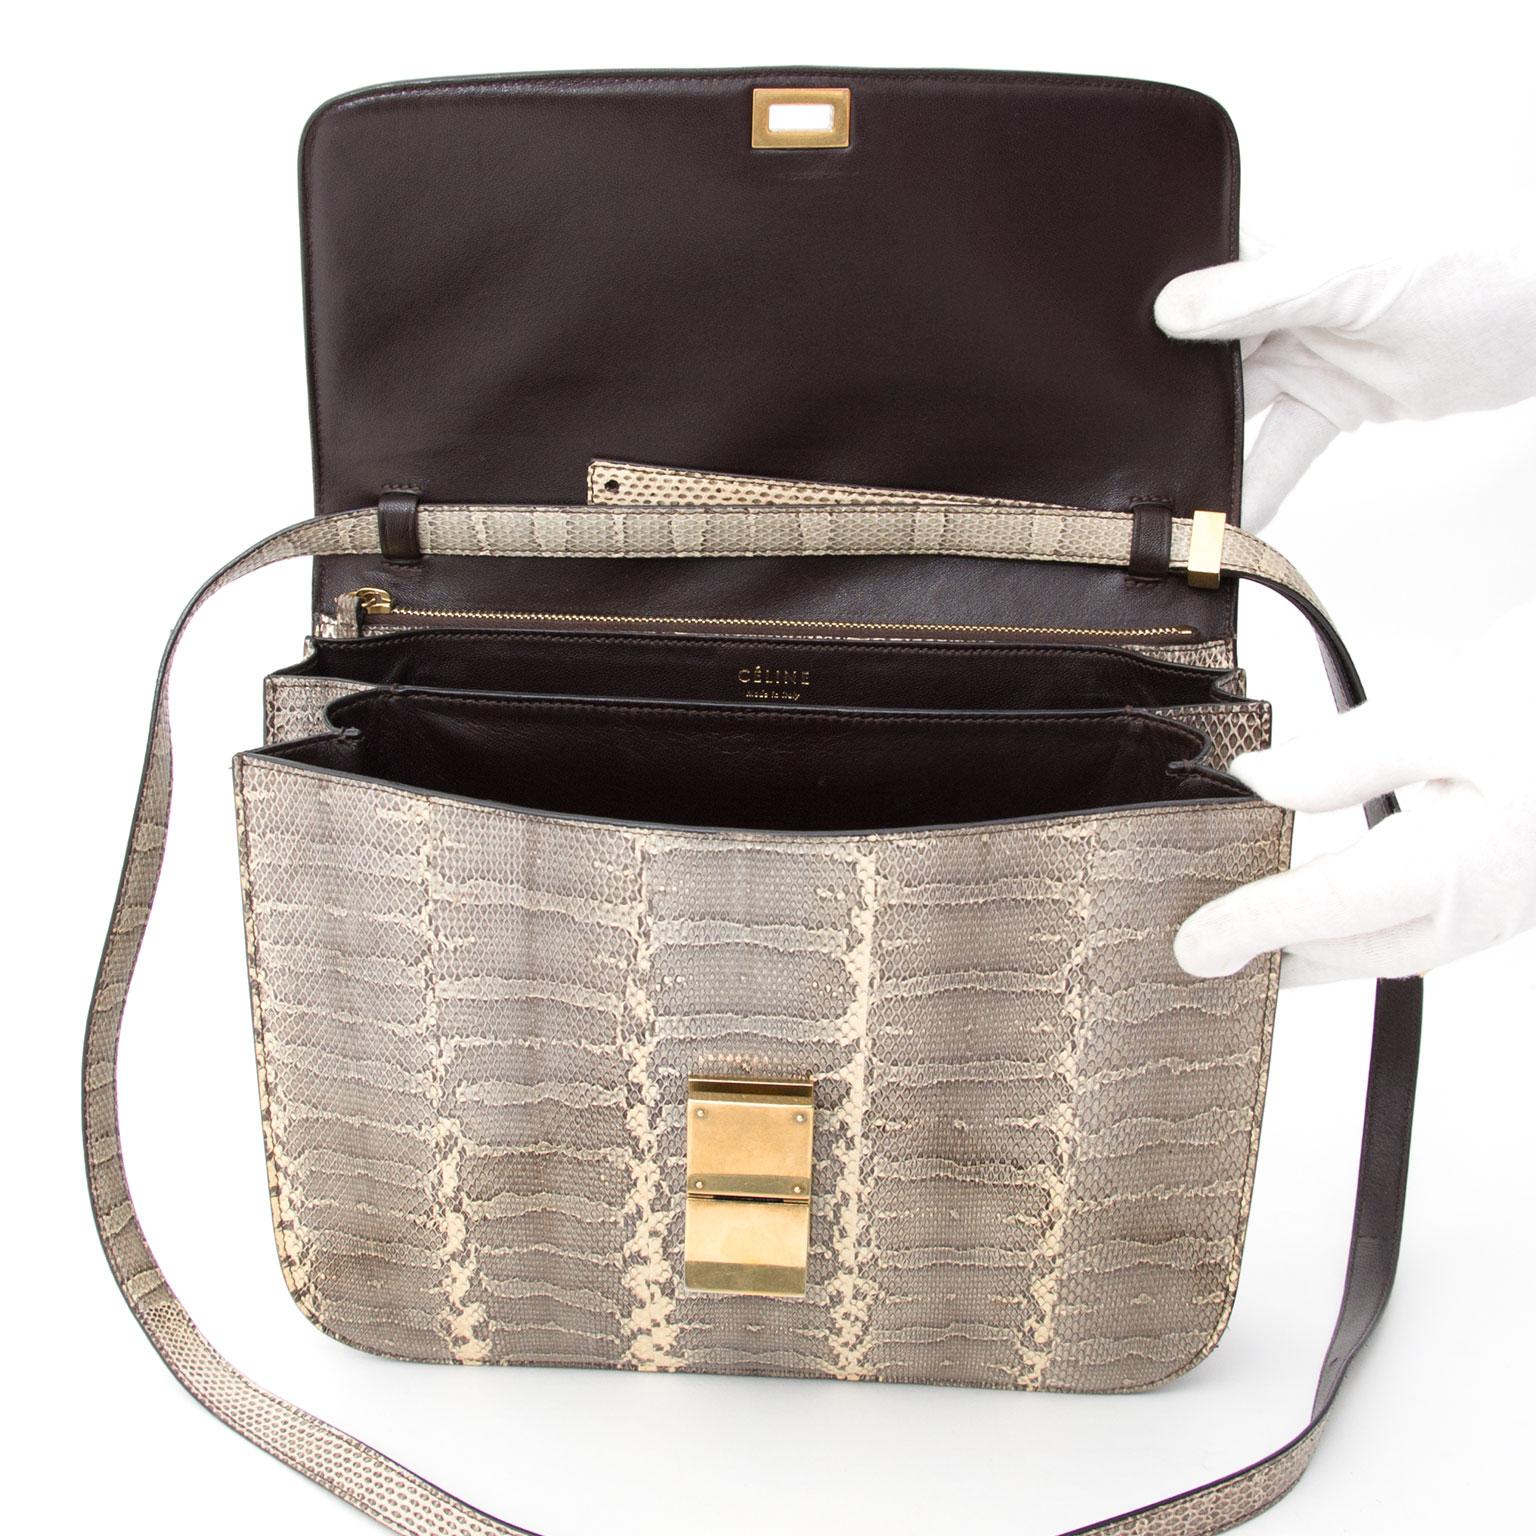 Céline Classic Ayers Large Flap Bag Vanilla secodne main designer vintage sac a main epaule en cuir